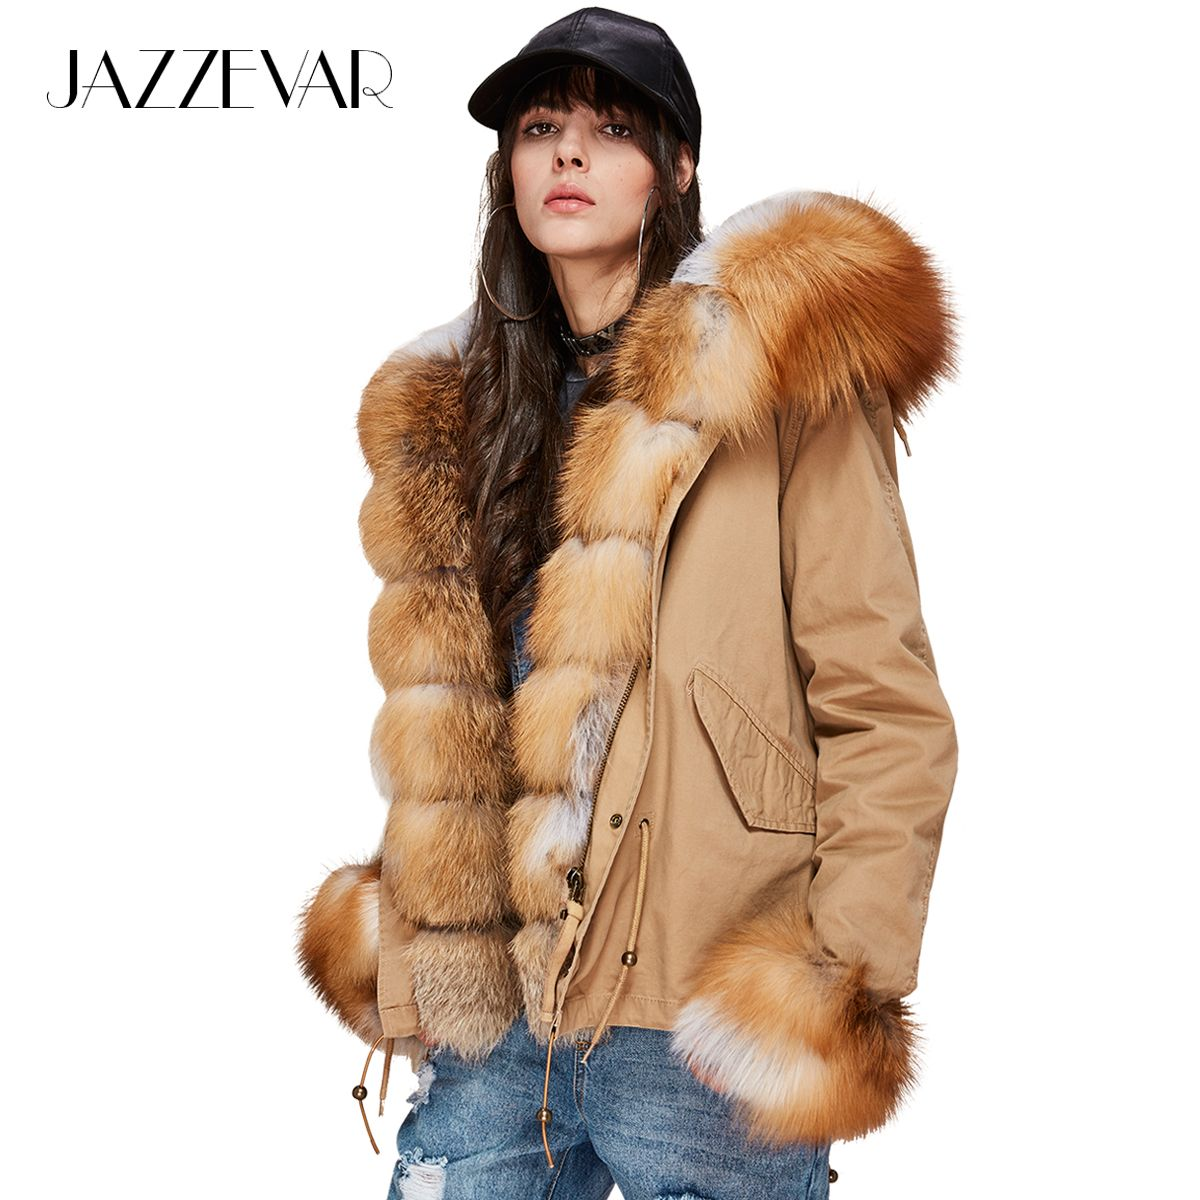 JAZZEVAR Neue Mode frauen Luxuriöse Große Echt Fox Pelz Kragen Manschette Mit Kapuze Mantel Kurze Parkas Outwear Winter Jacke